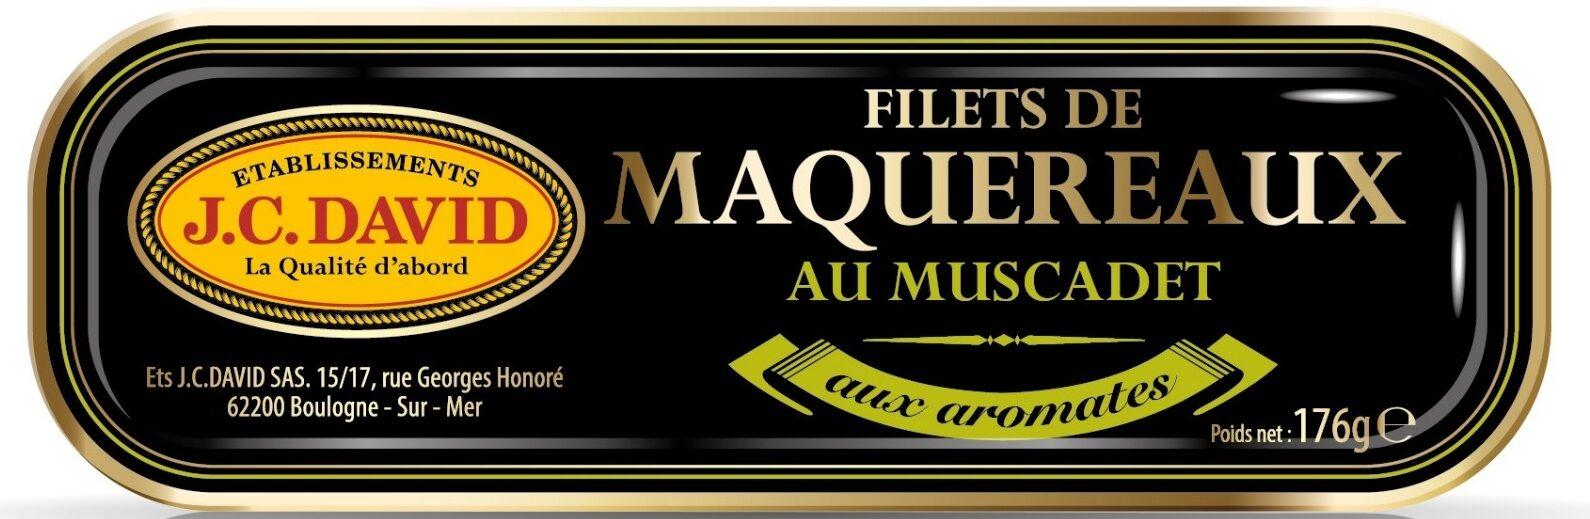 Филе скумбрии с вином Muscadet 176г